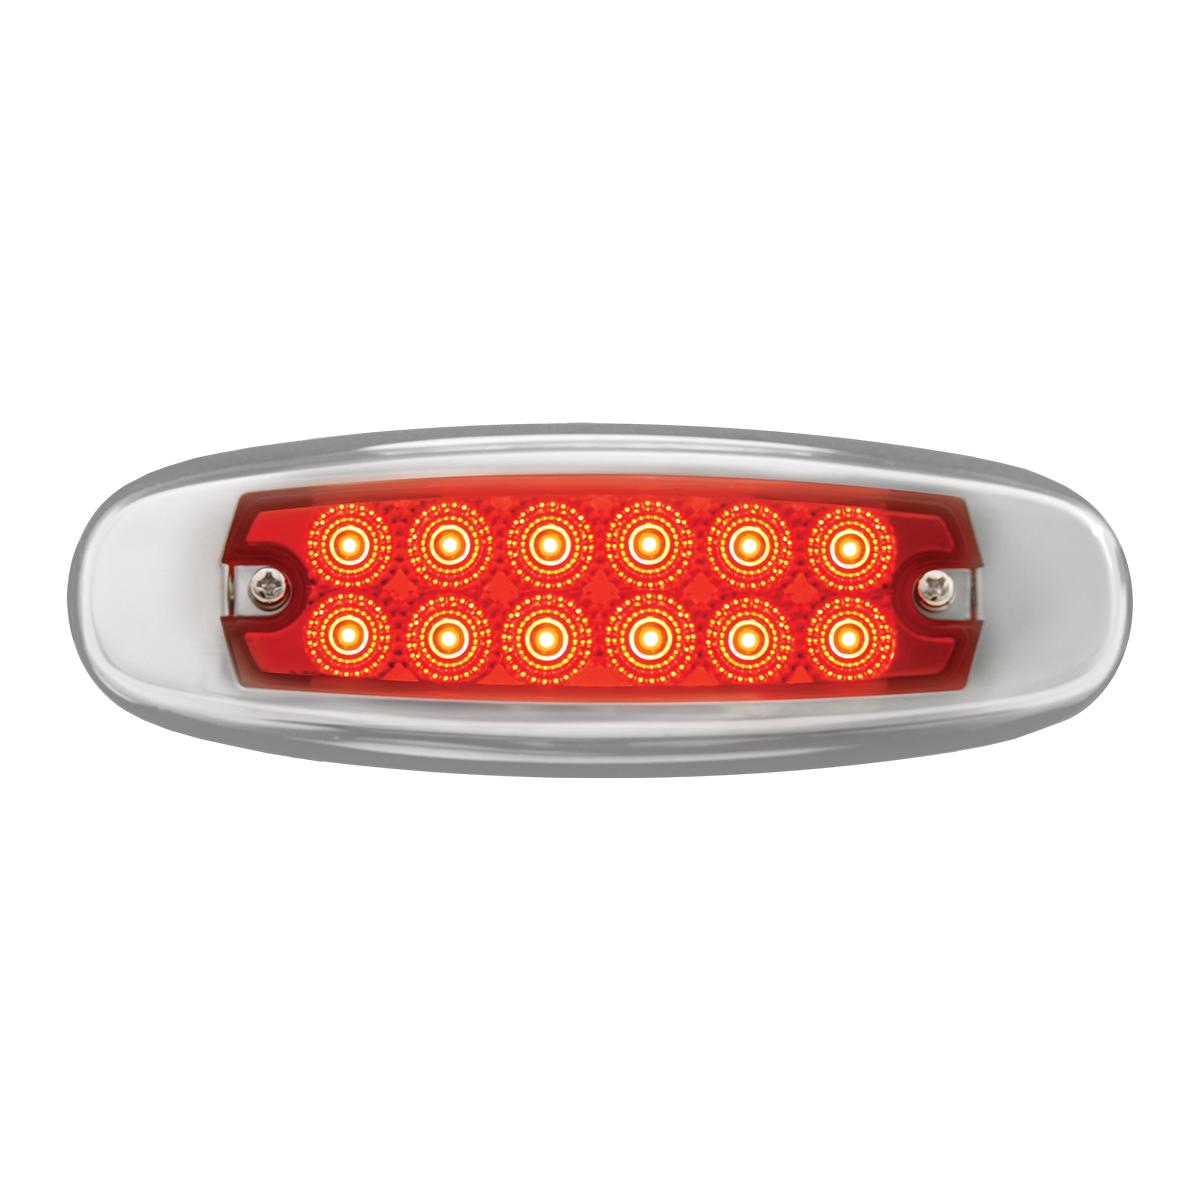 76442 Ultra Thin Dual Function Spyder LED Light w/ Stainless Steel Bezel